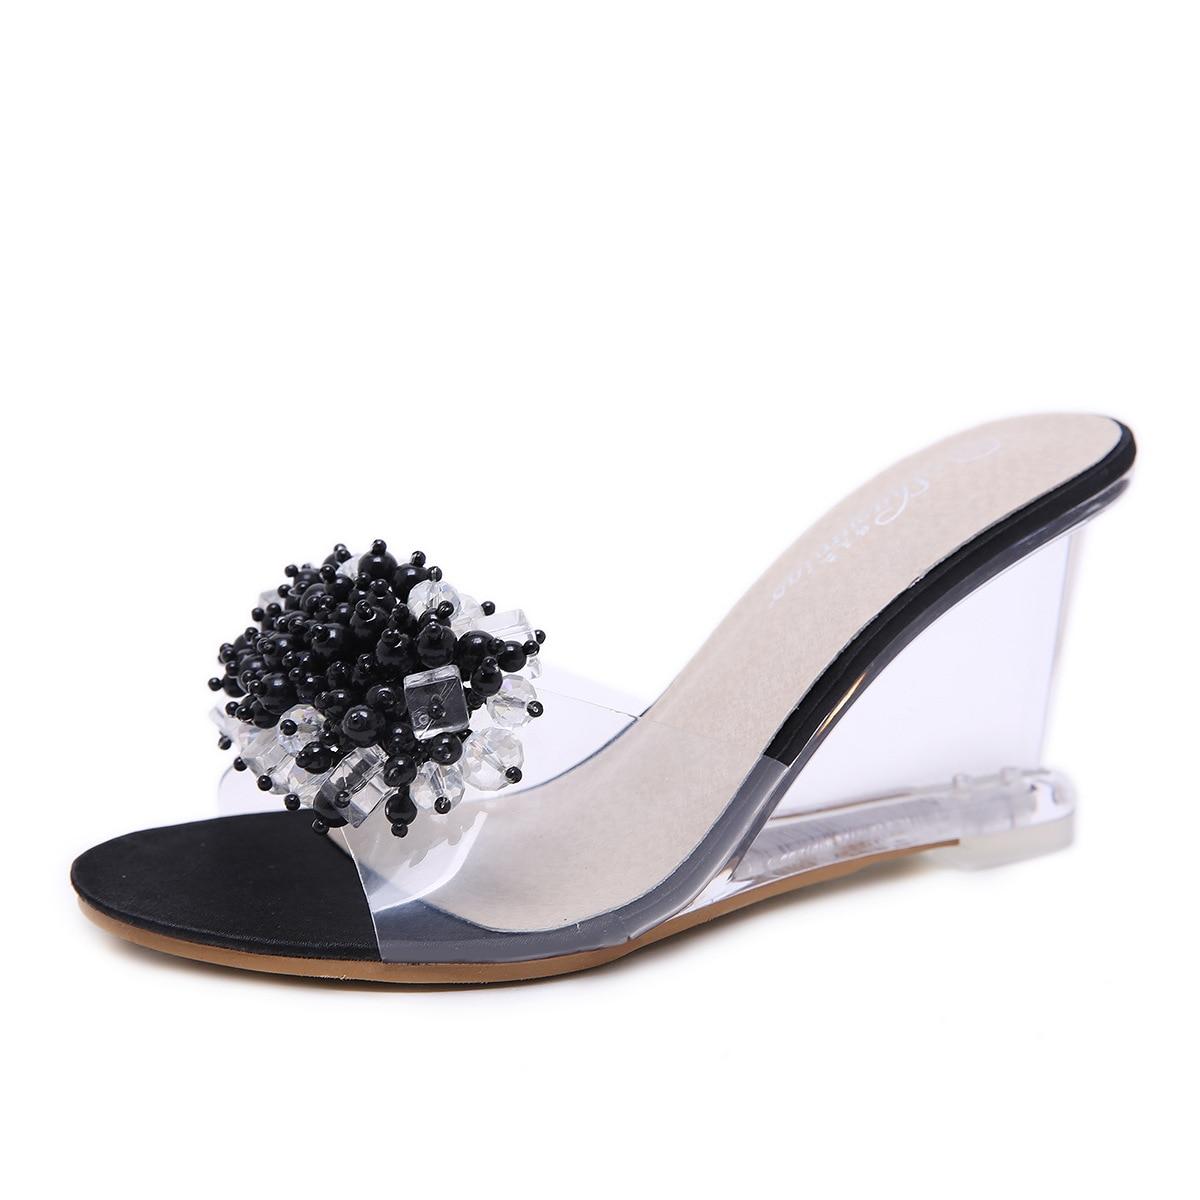 Wedges sandals female summer 2018 new sexy crystal transparent high heels glass rhinestones